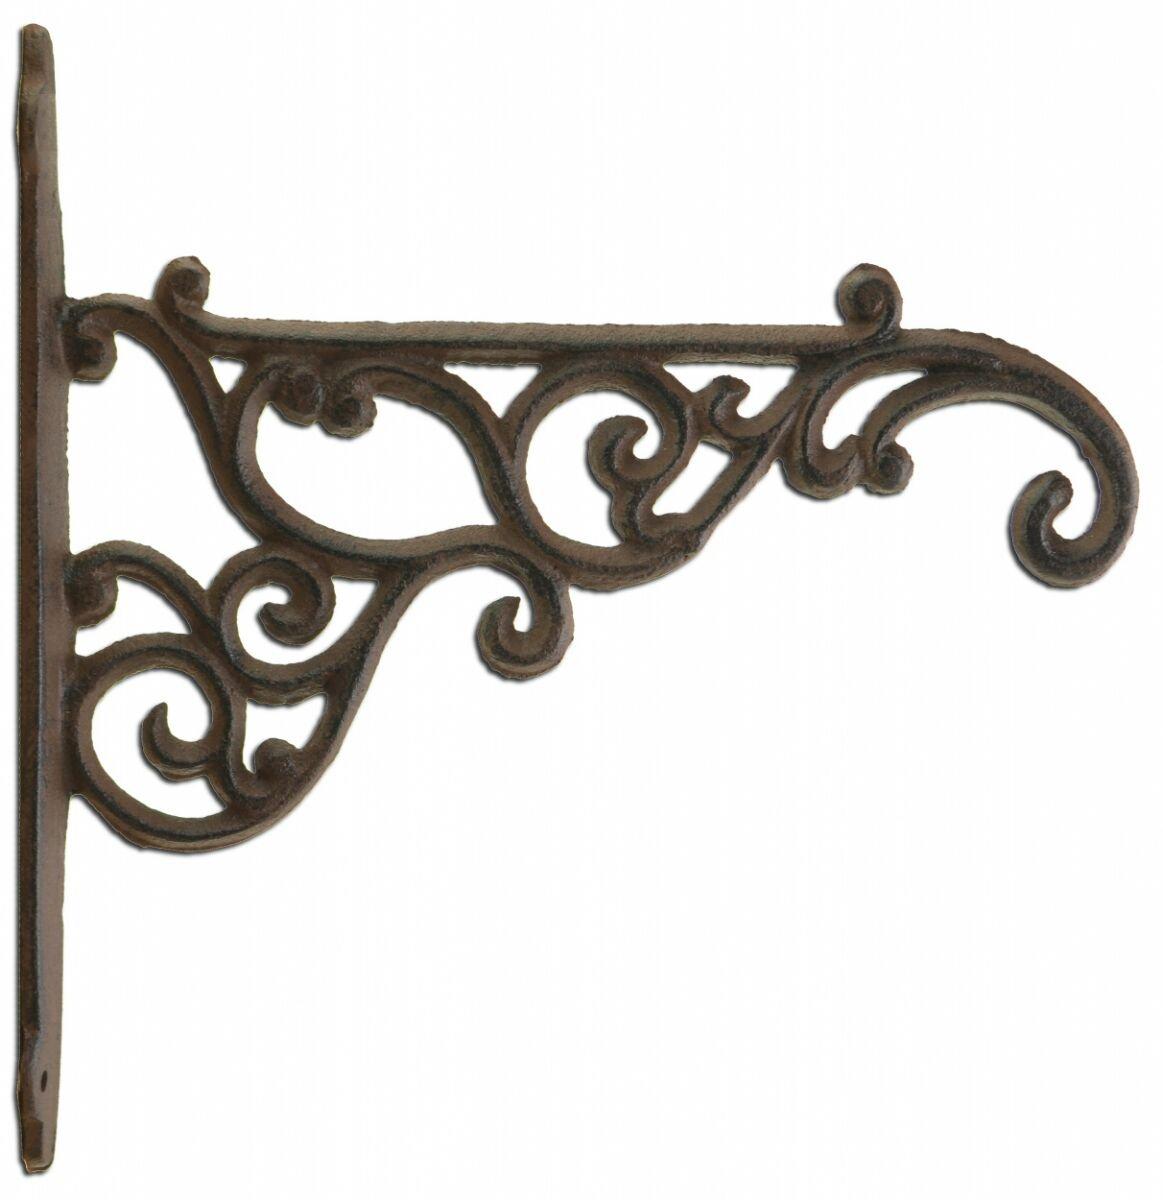 Decorative Plant Hanger Ornate Victorian Cast Iron Flower Basket Hook 8.375'' Deep by Import Wholesales